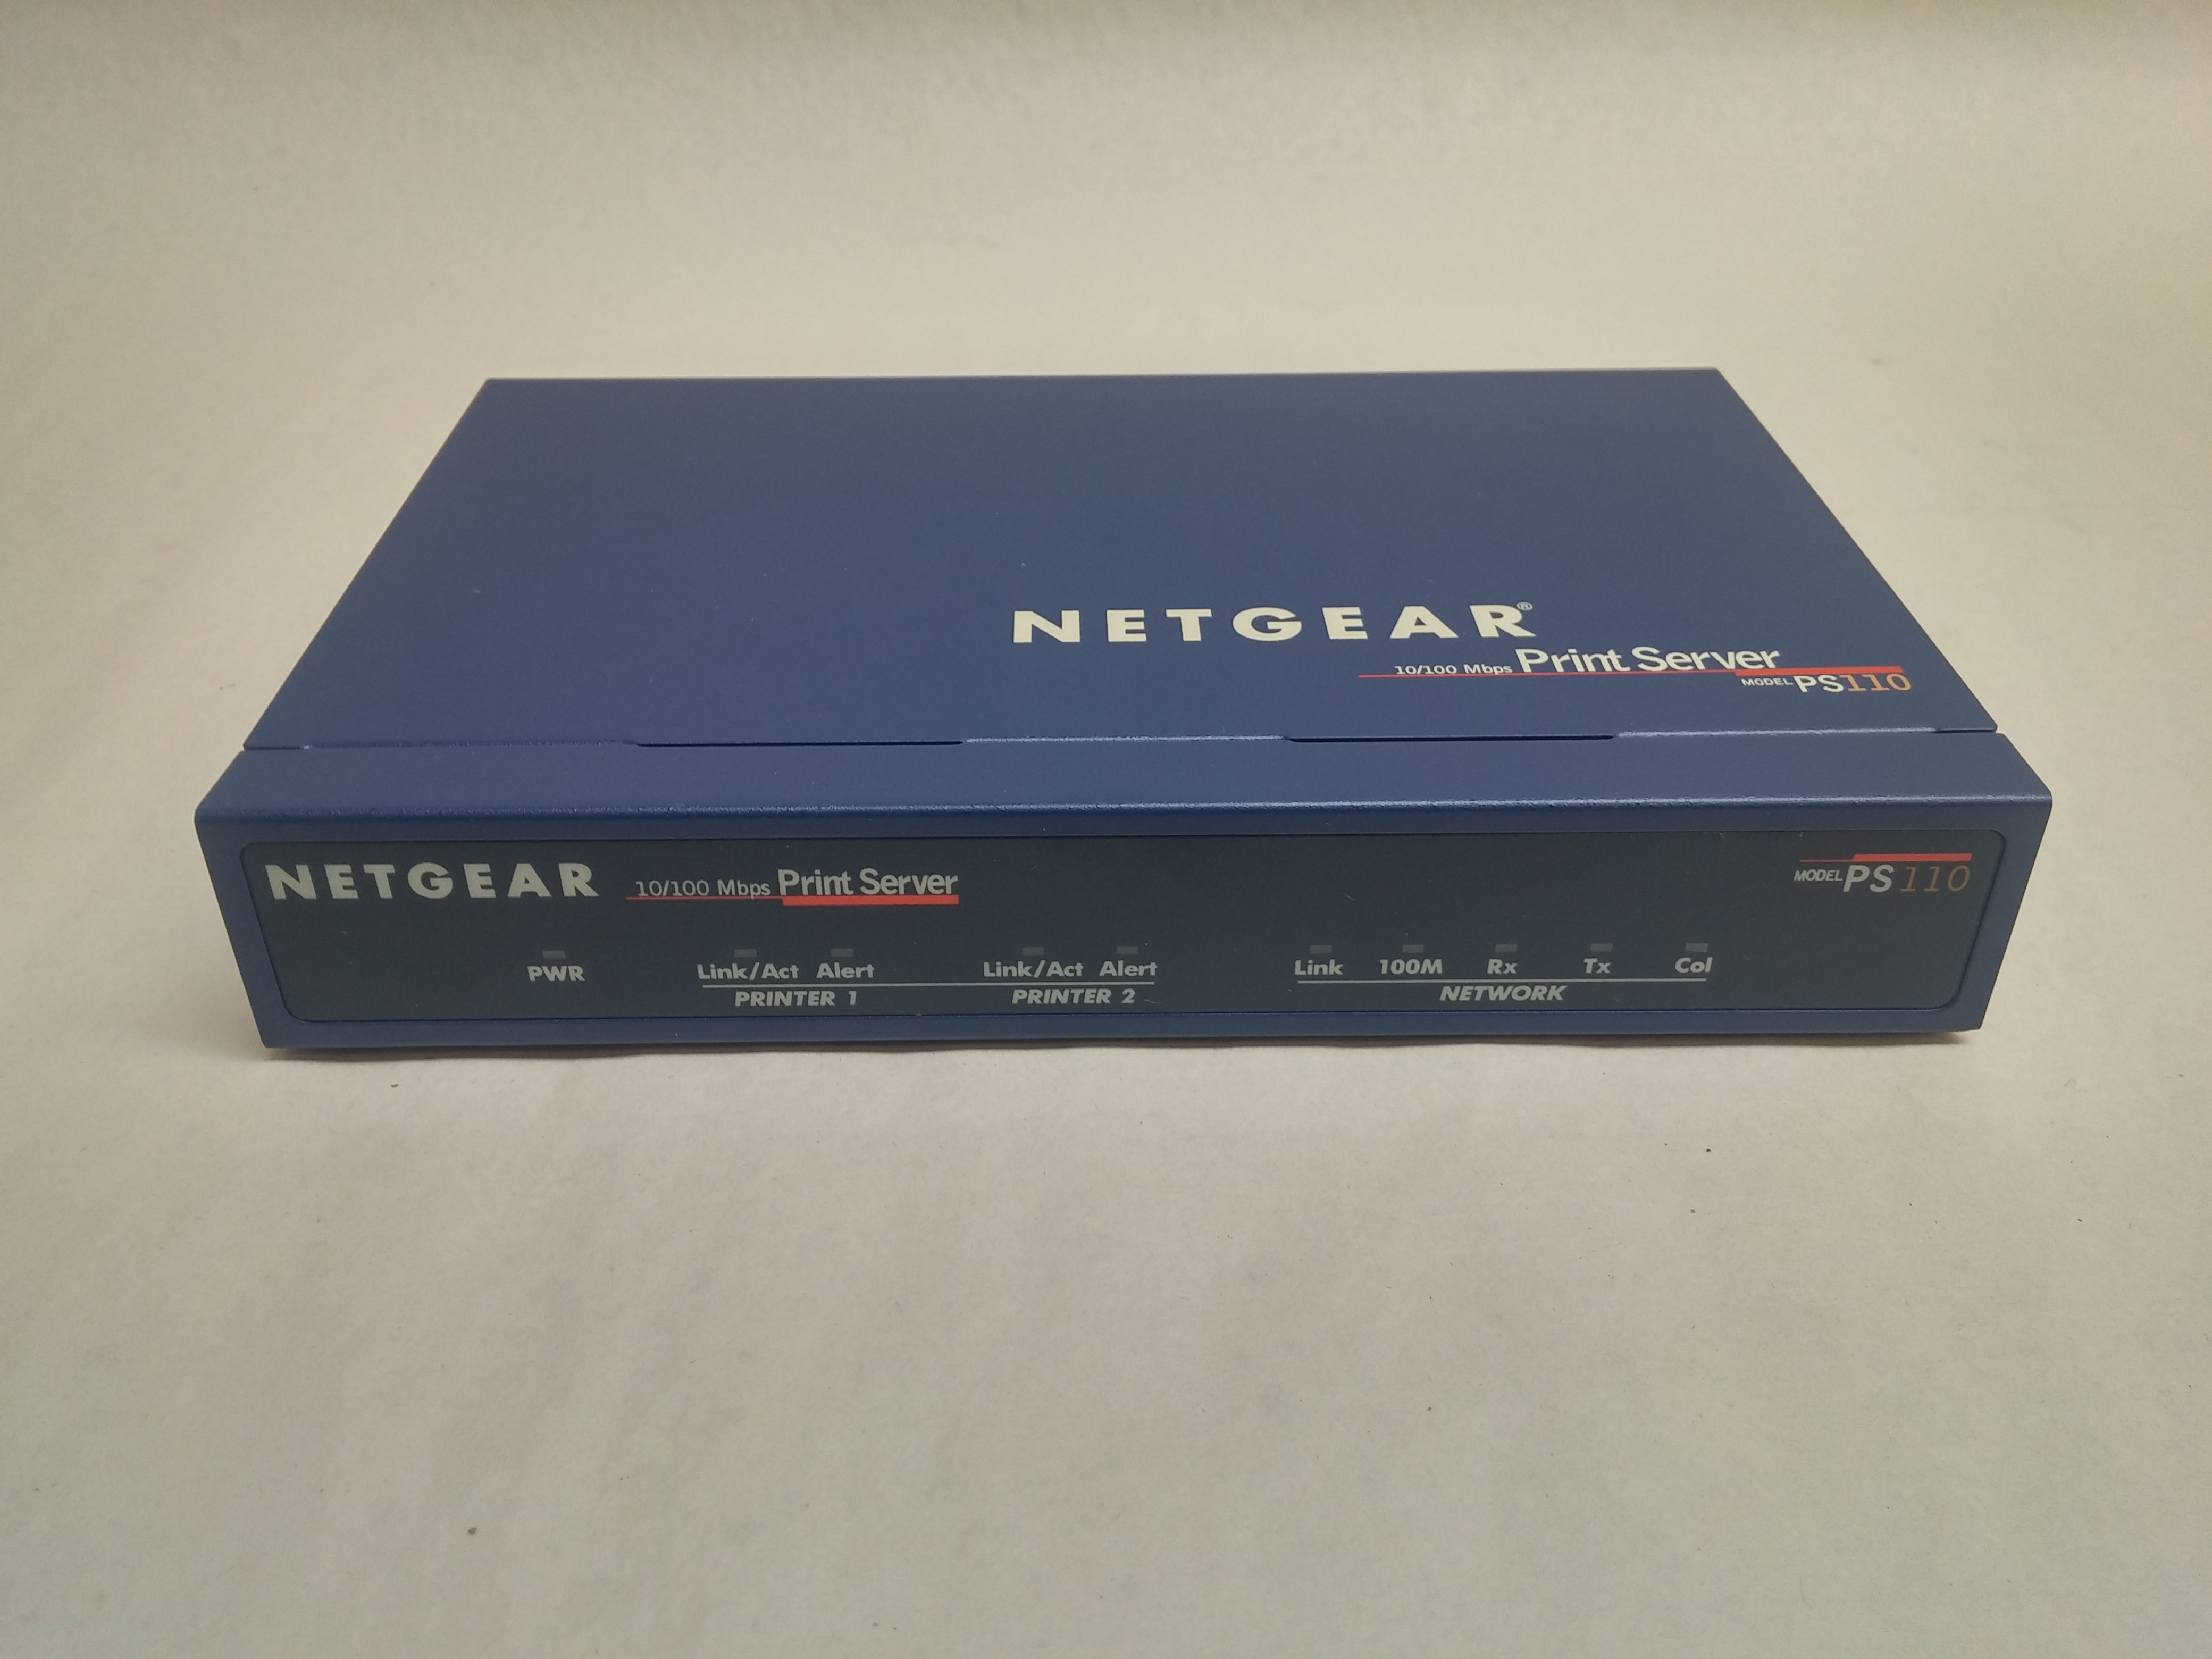 NETGEAR PS110 Print Server Driver for Windows Download